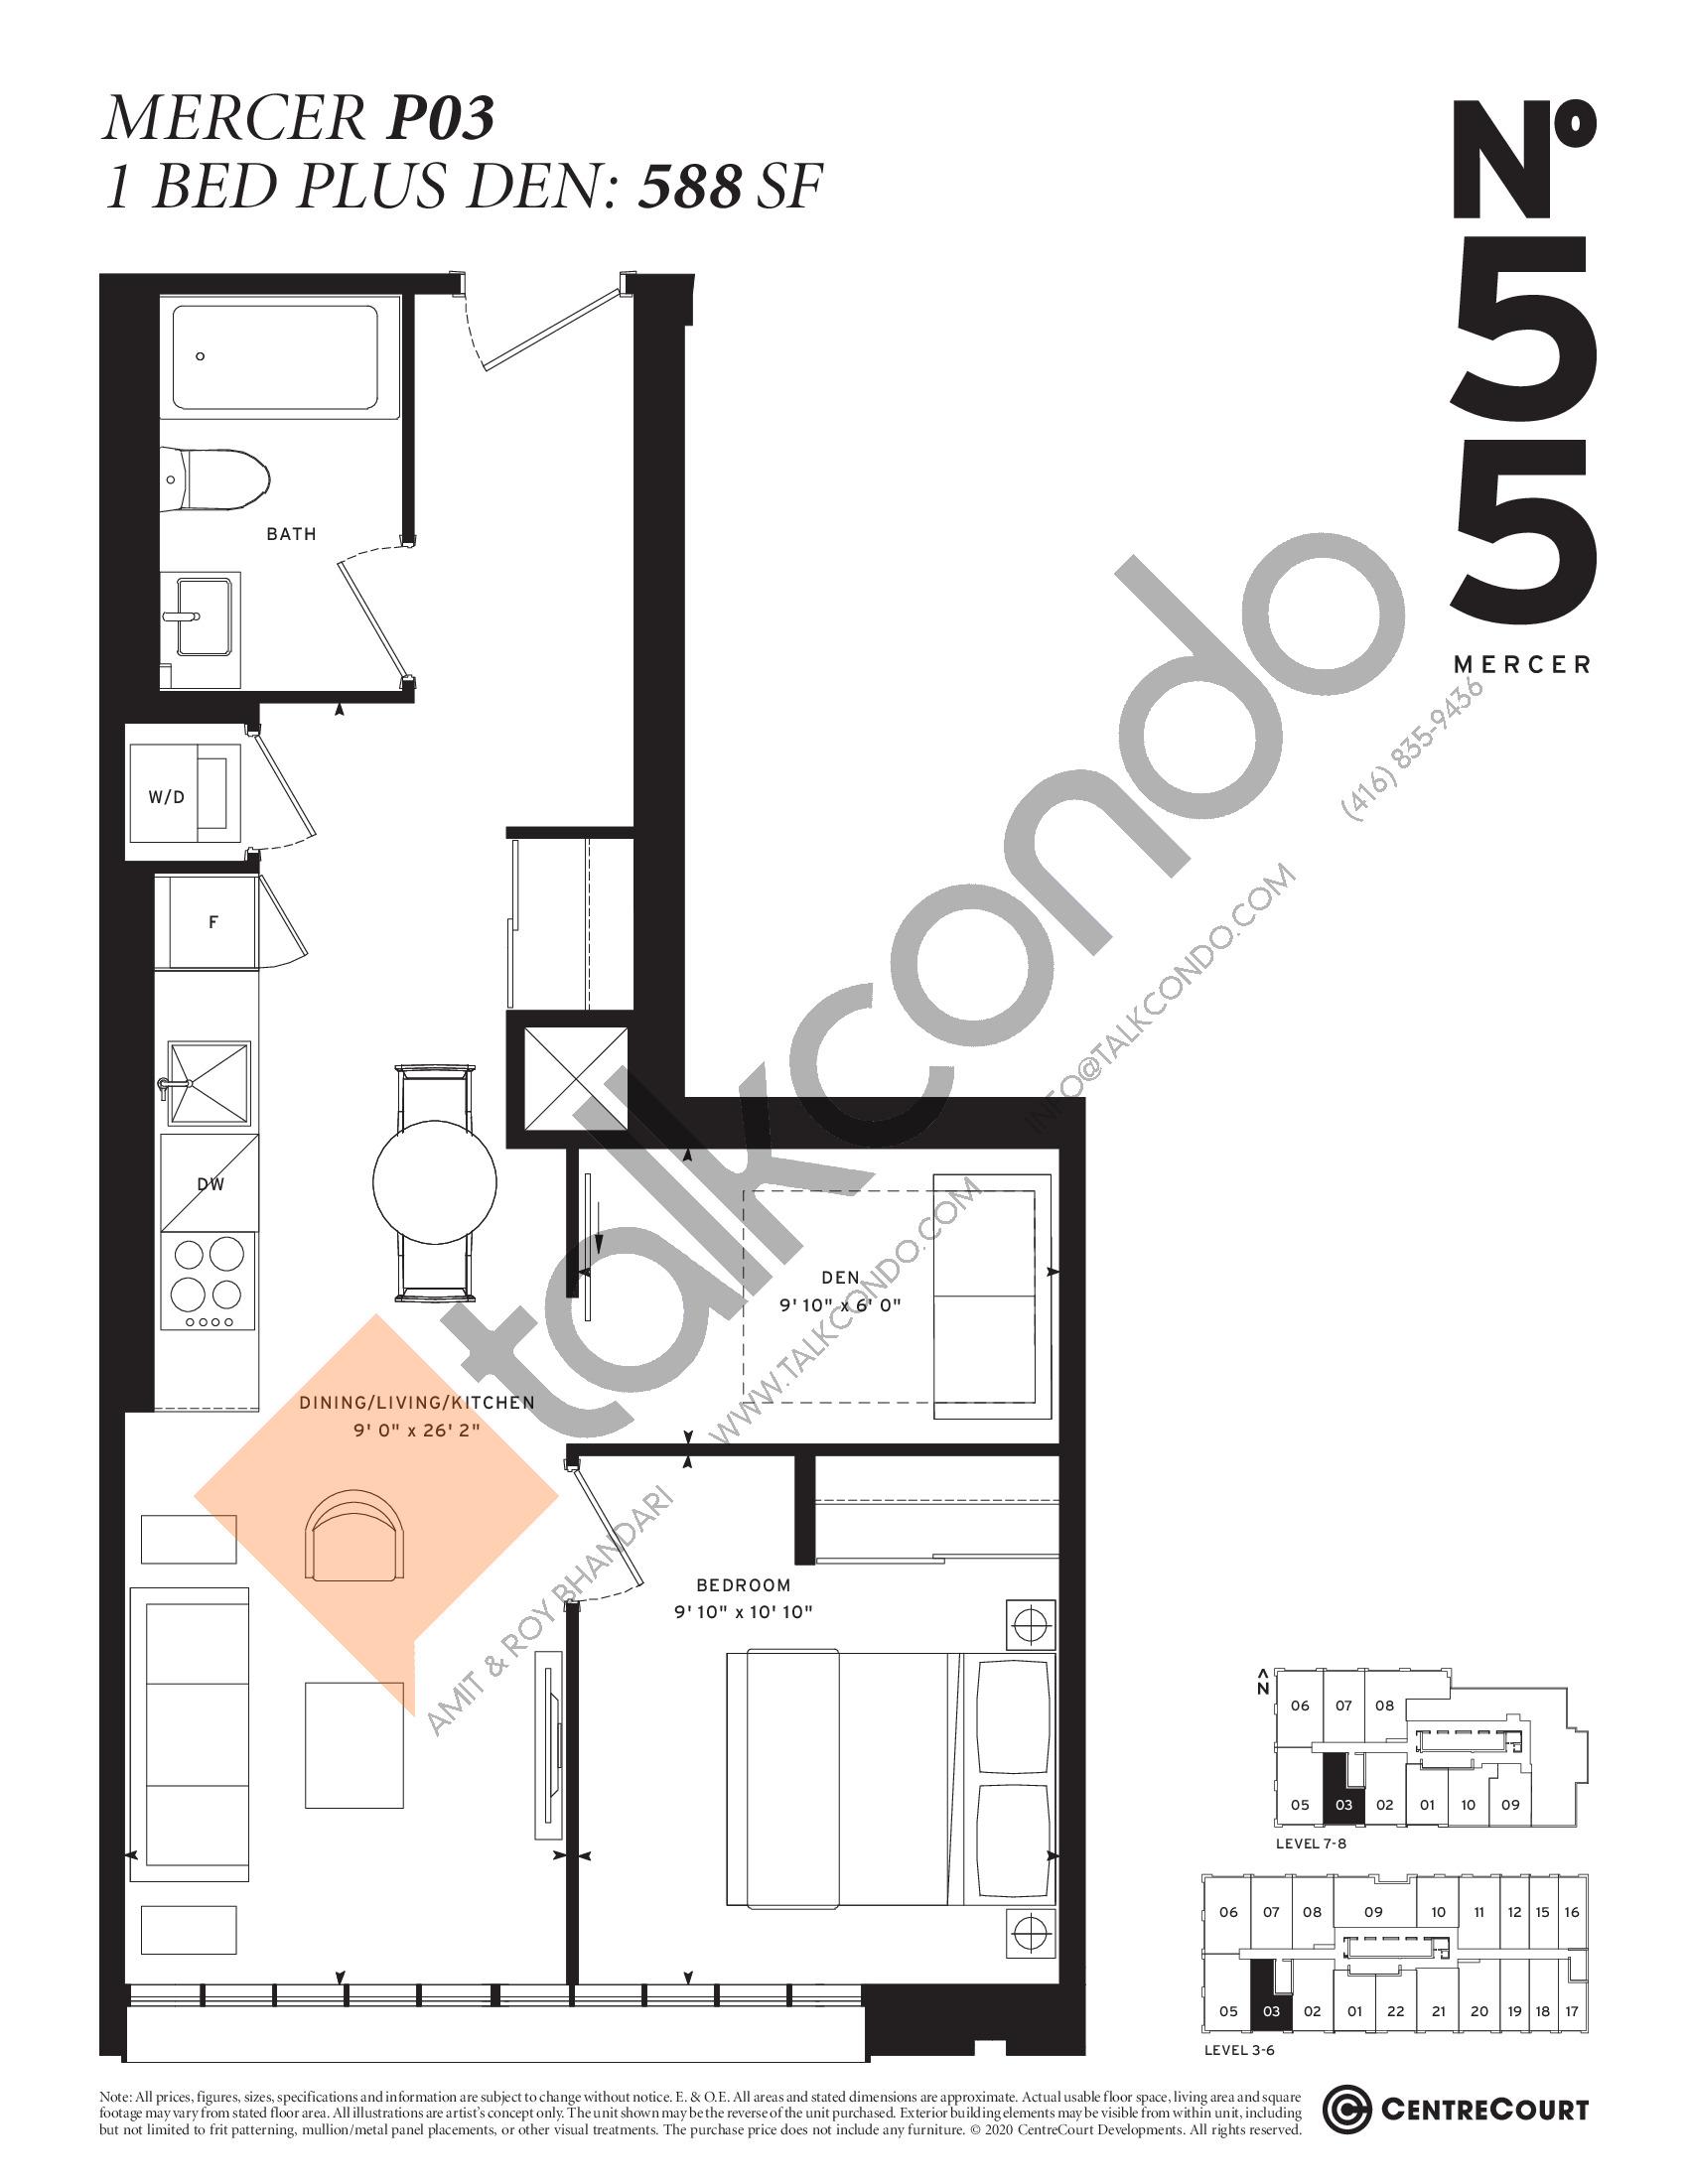 Mercer P03 Floor Plan at No. 55 Mercer Condos - 588 sq.ft